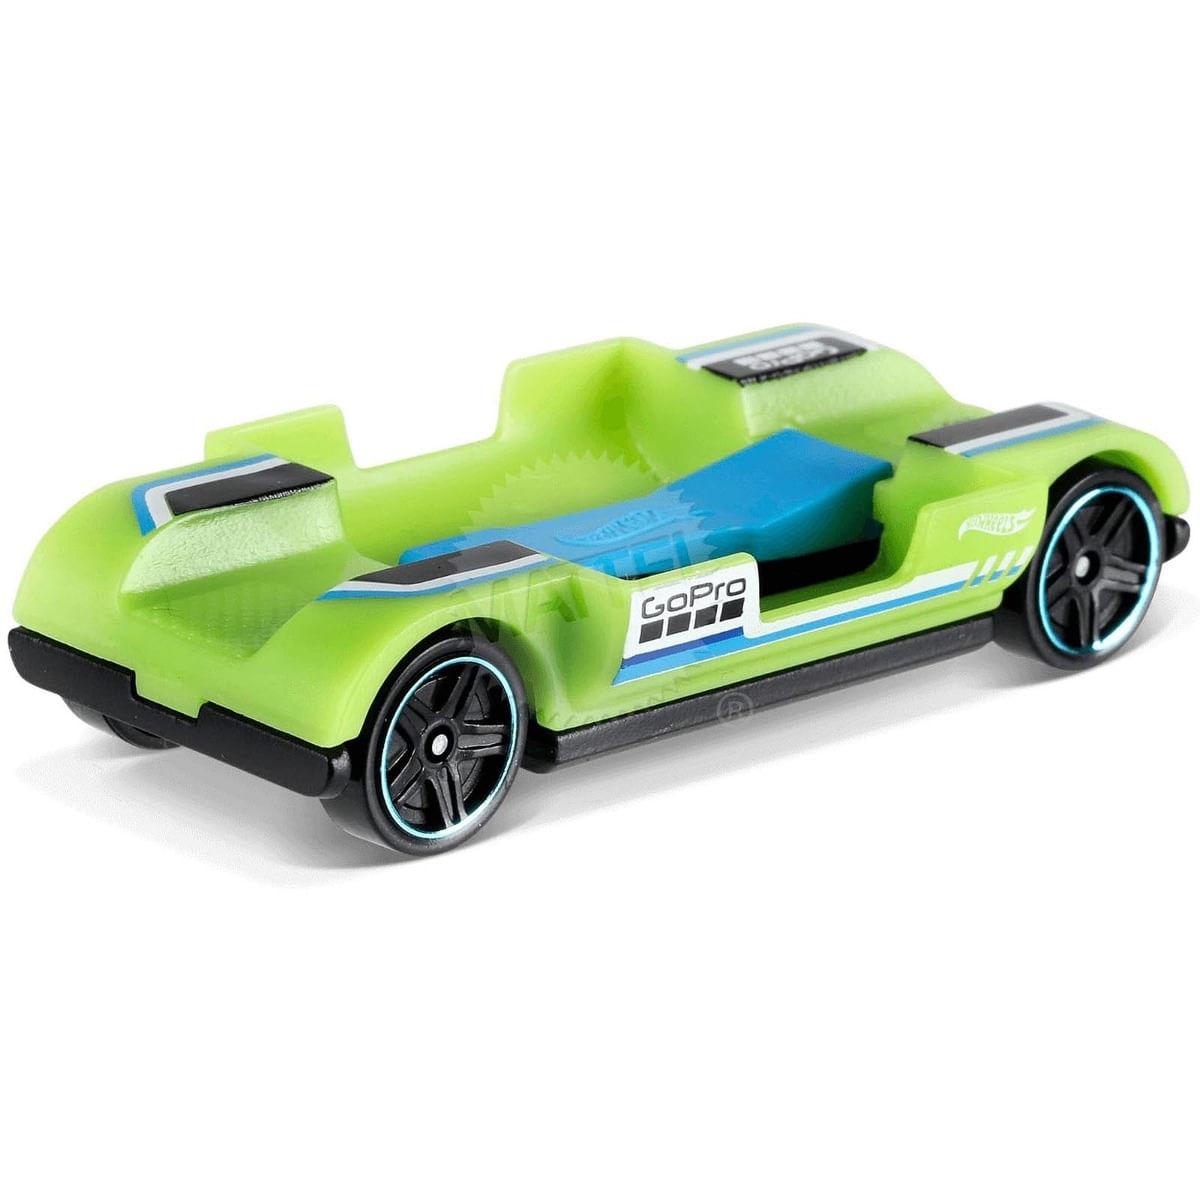 Hot Wheels Básico - Collectors - Experimotors Zoom - I Gopro - Verde - Mattel